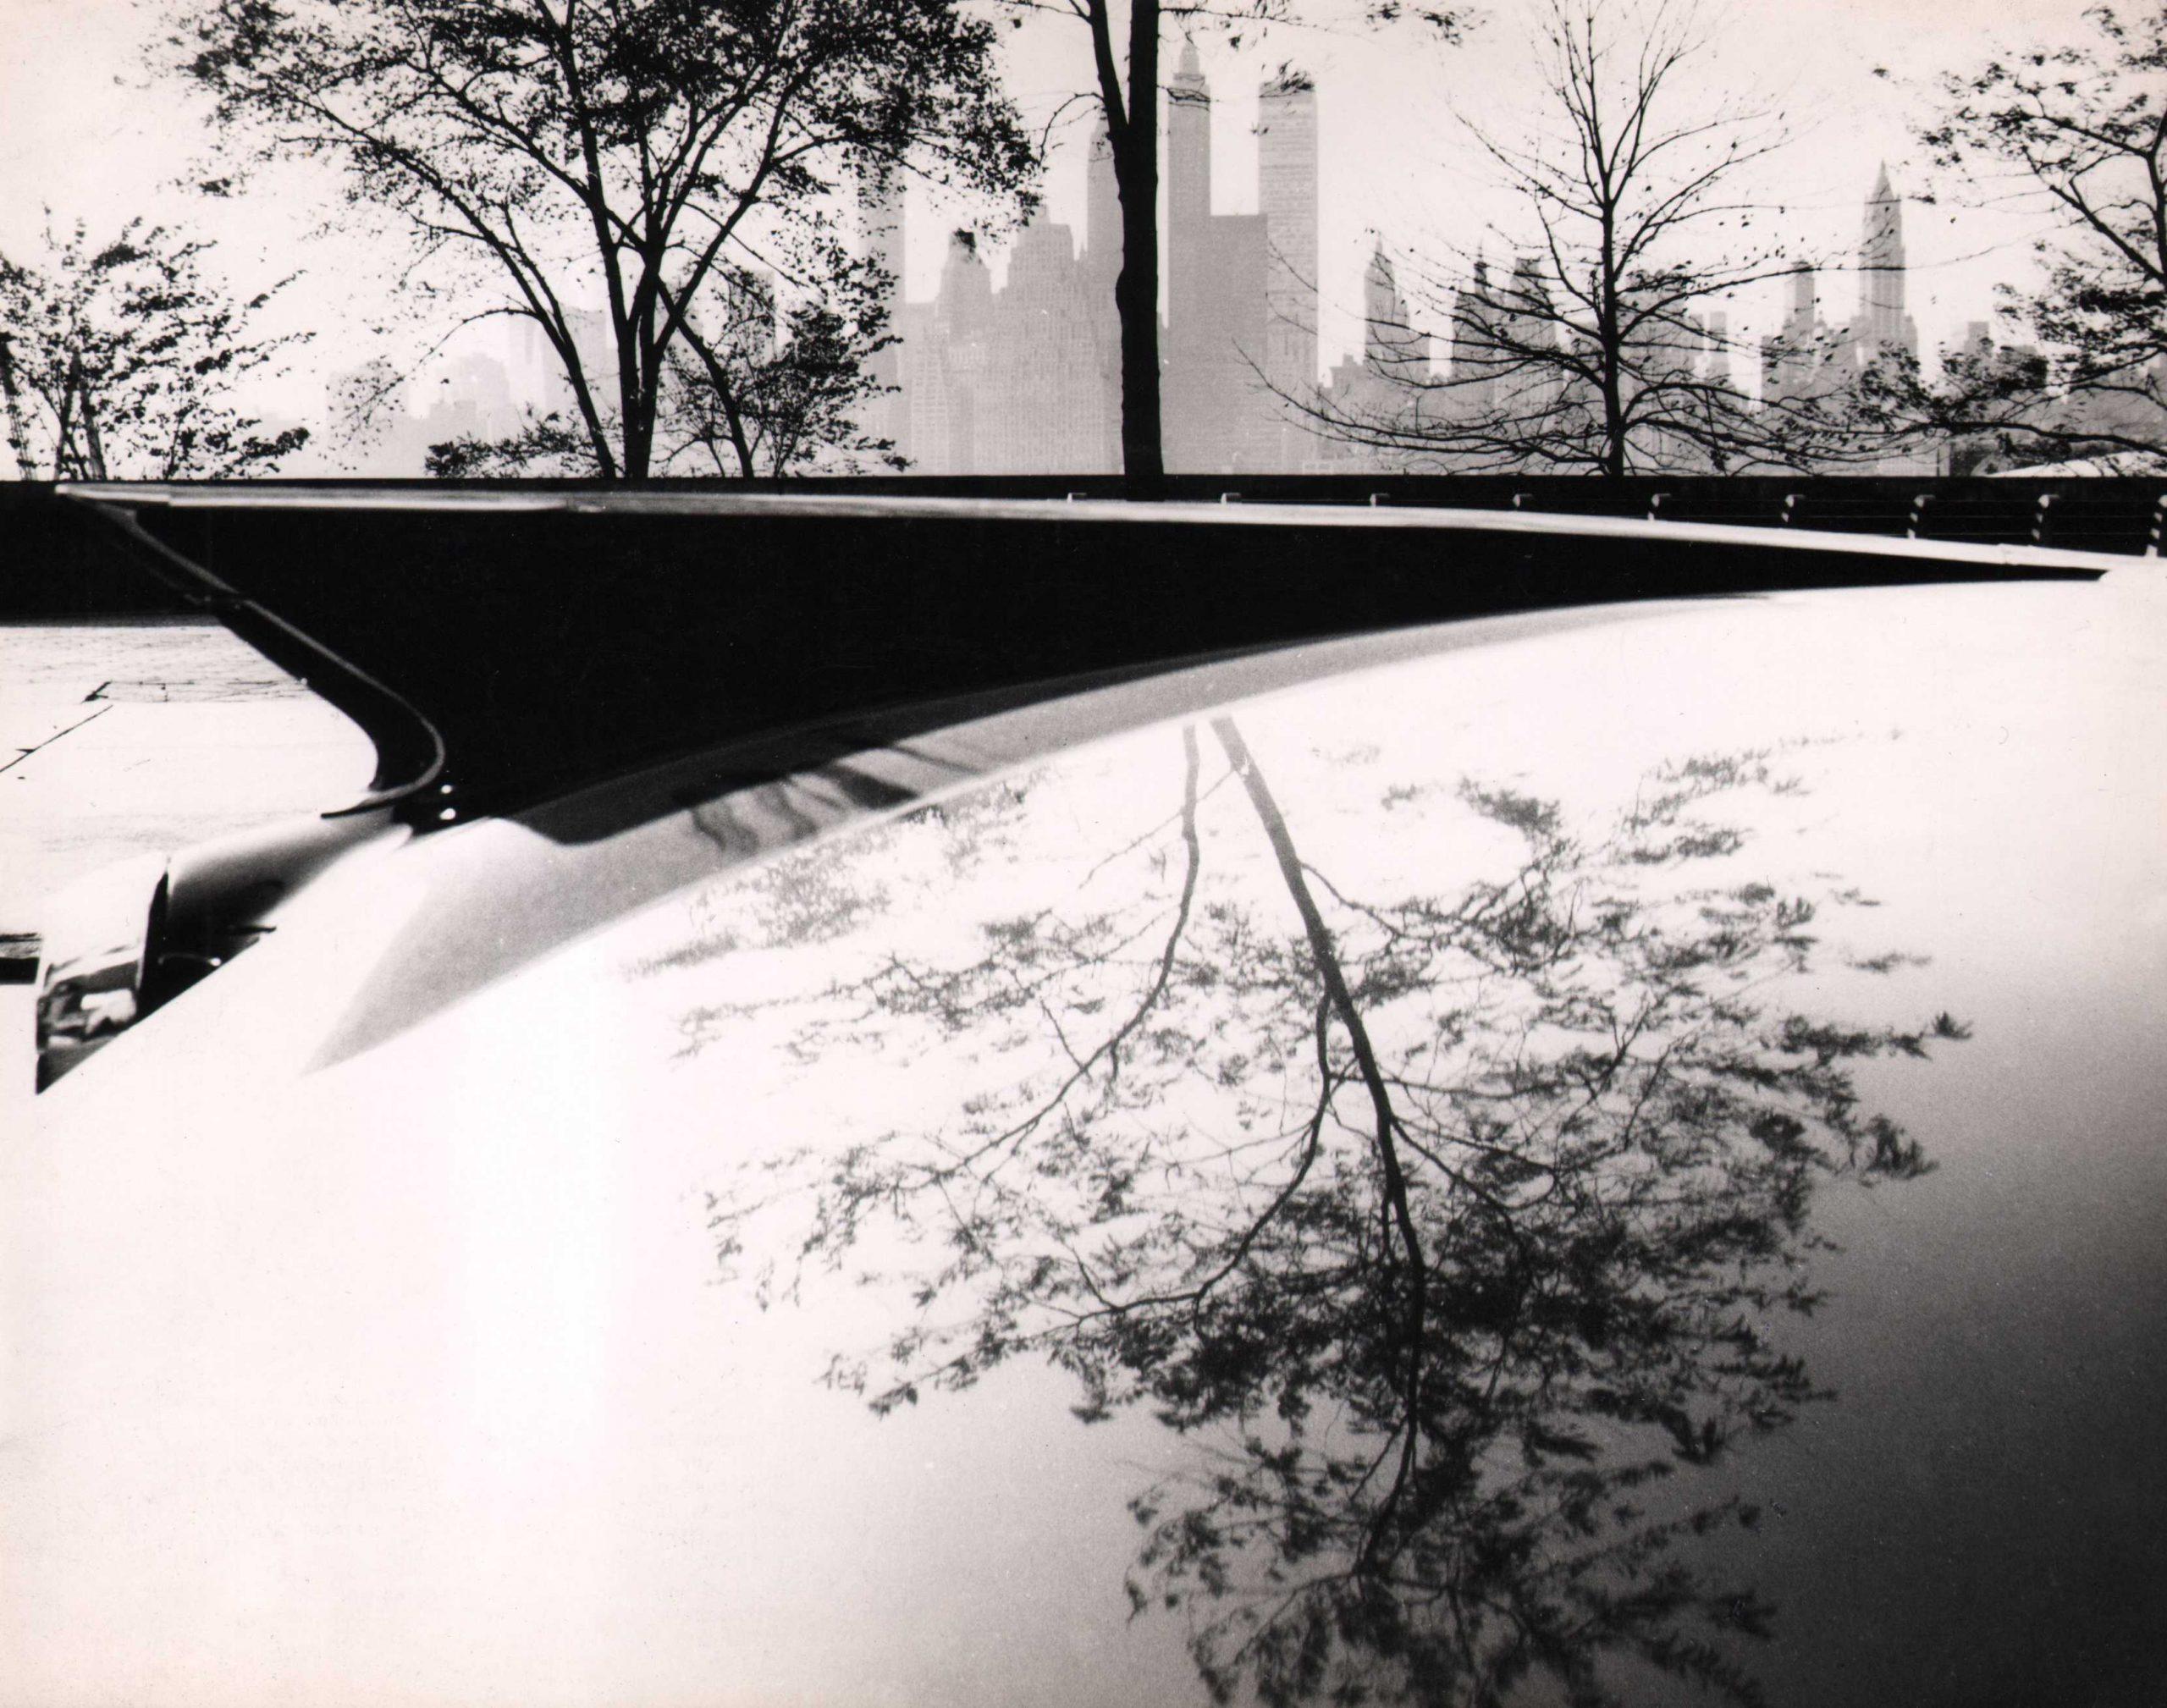 Jan Lukas, Untitled, 1963